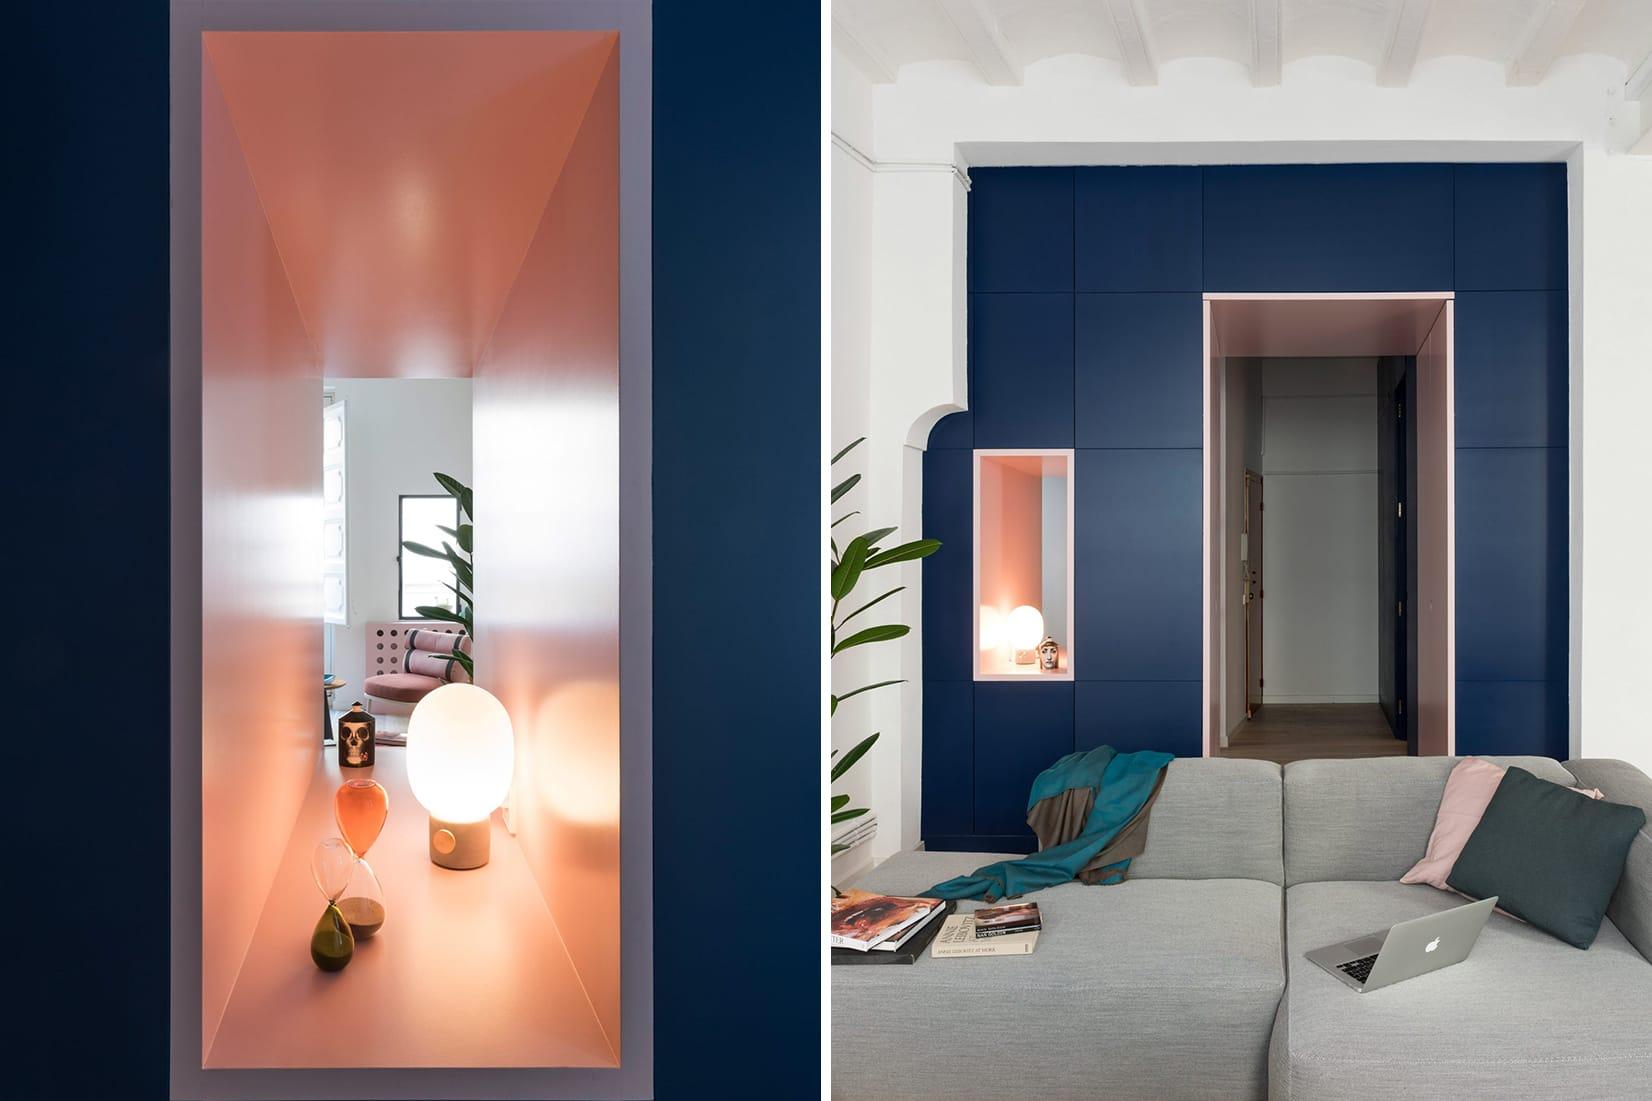 Pastel Interieur Barcelona : Decorate with pastel colors design ideas pictures inspiration